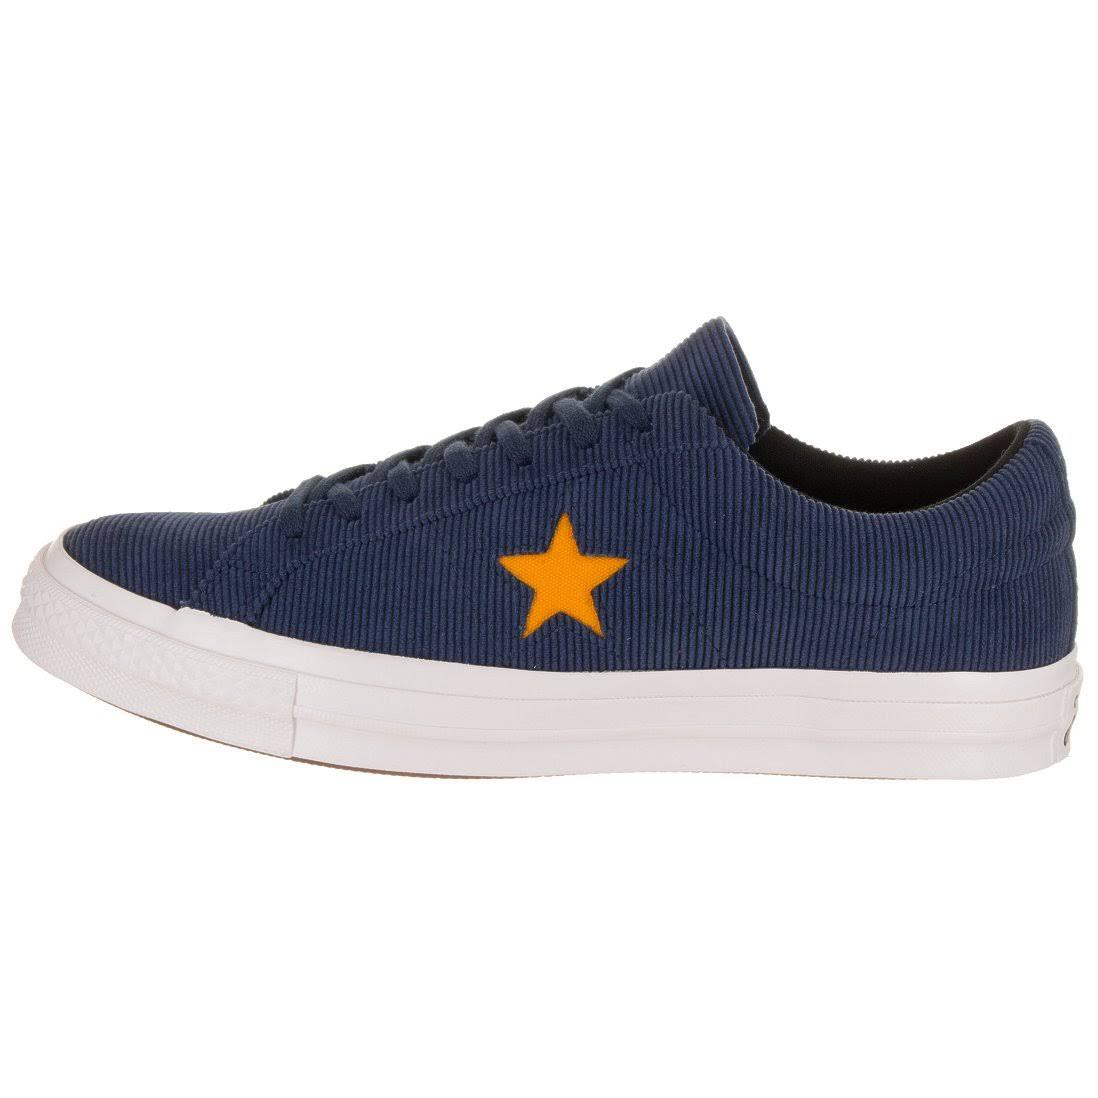 Informal Dorado Ox Star One Universidad Marino Calzado Azul Converse Unisex HSqXzx4